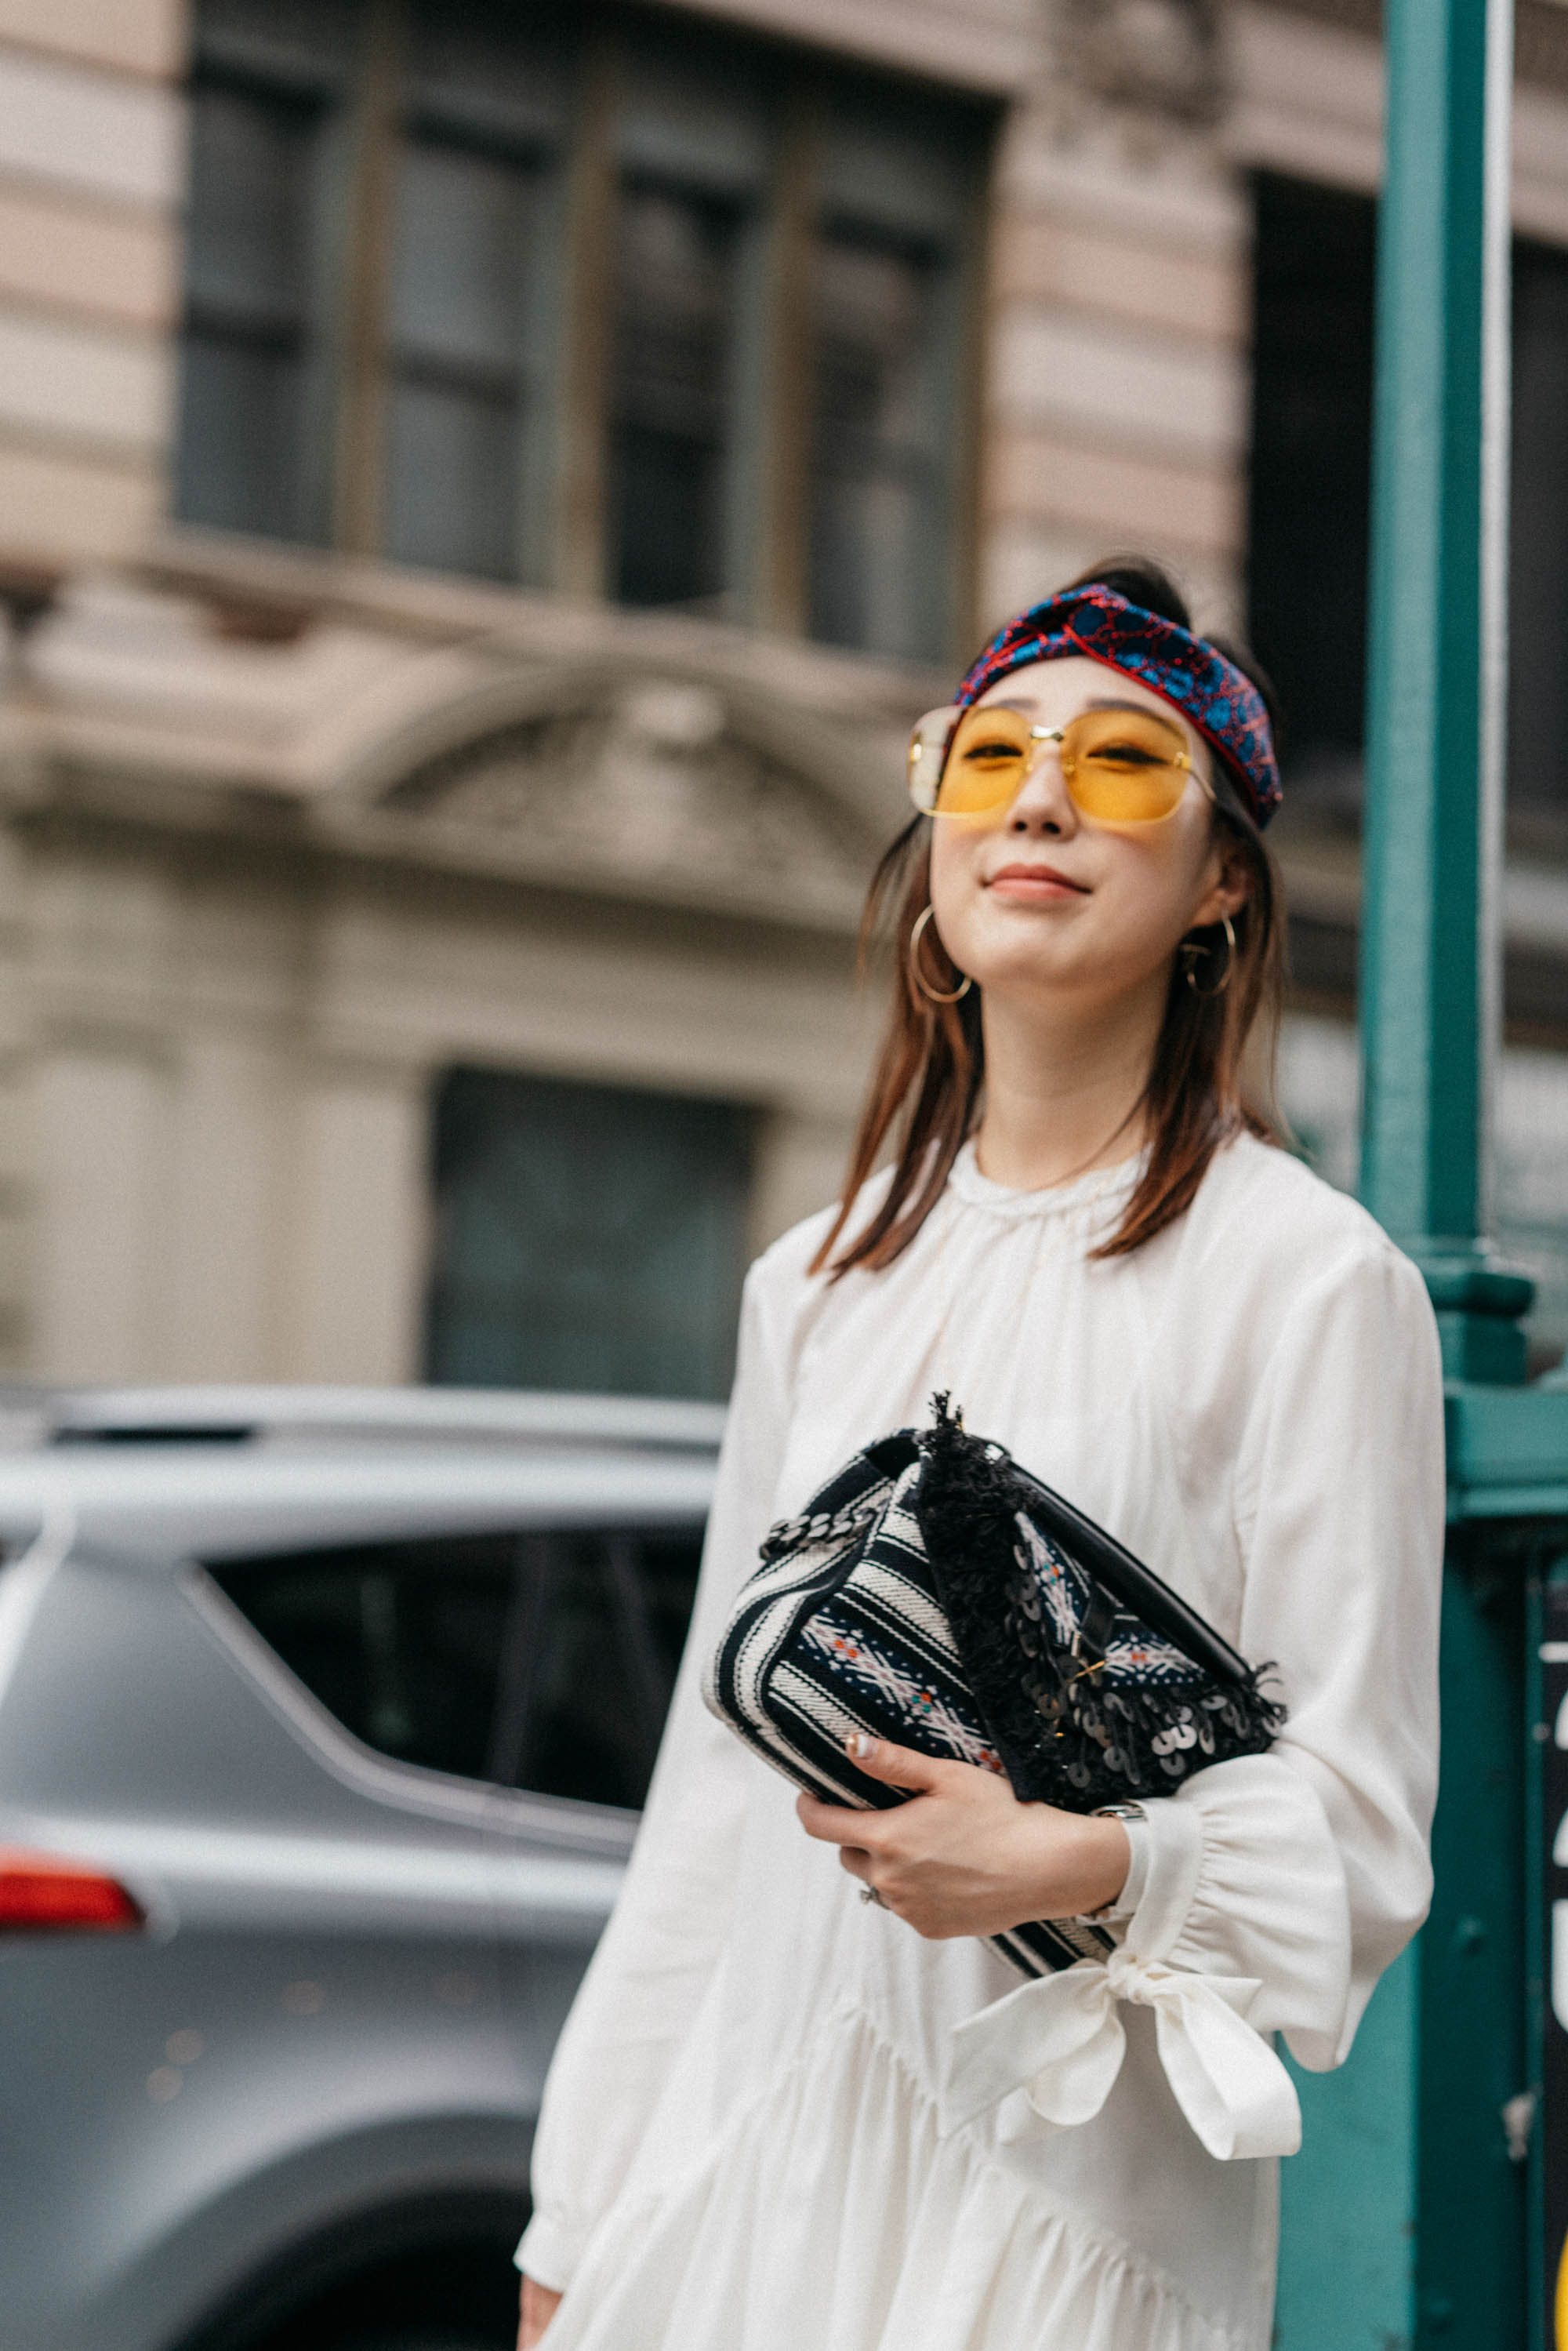 Prada Dress, Saint Laurent Bag, Gucci Sunglasses, Gucci Headband